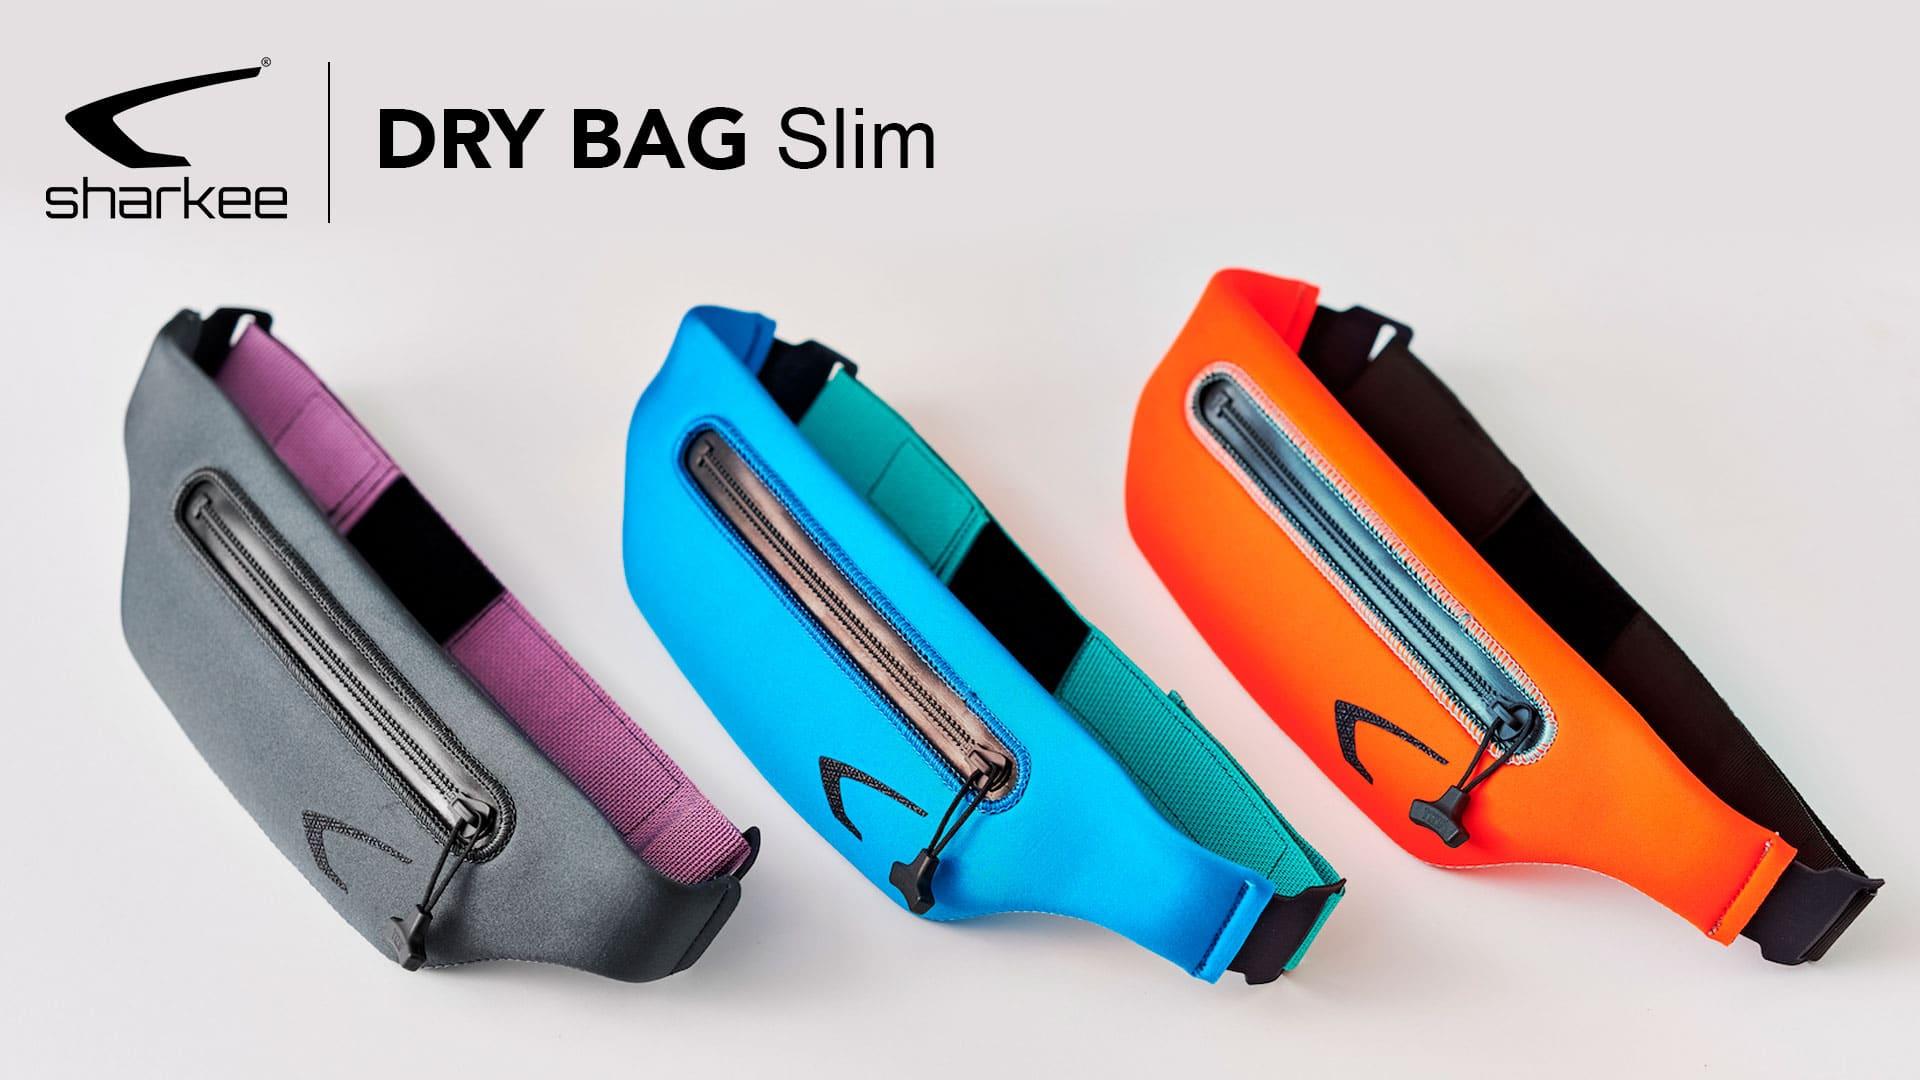 Sharkee Dry Bag SLIM